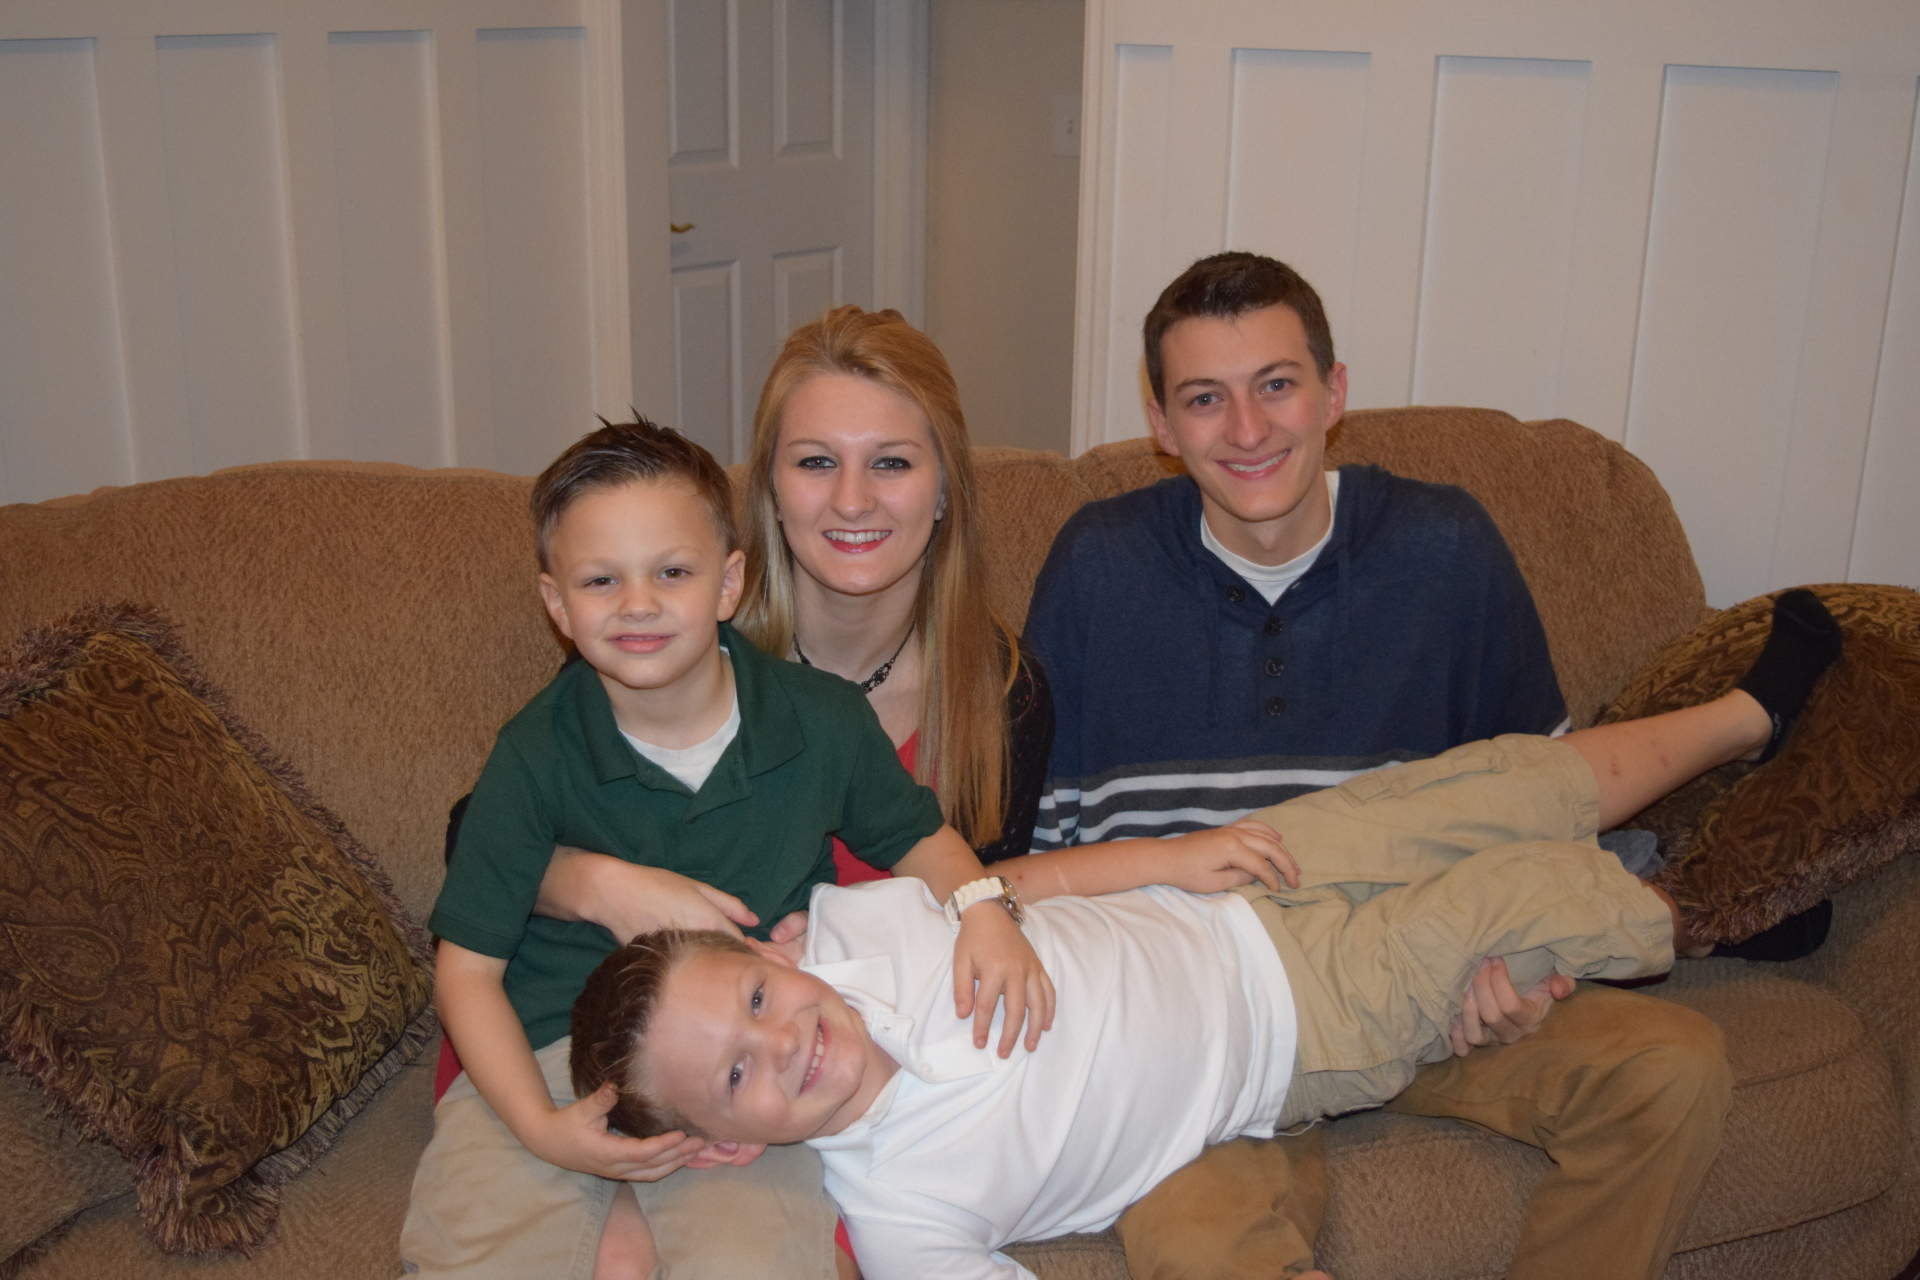 4 of the 6 Children